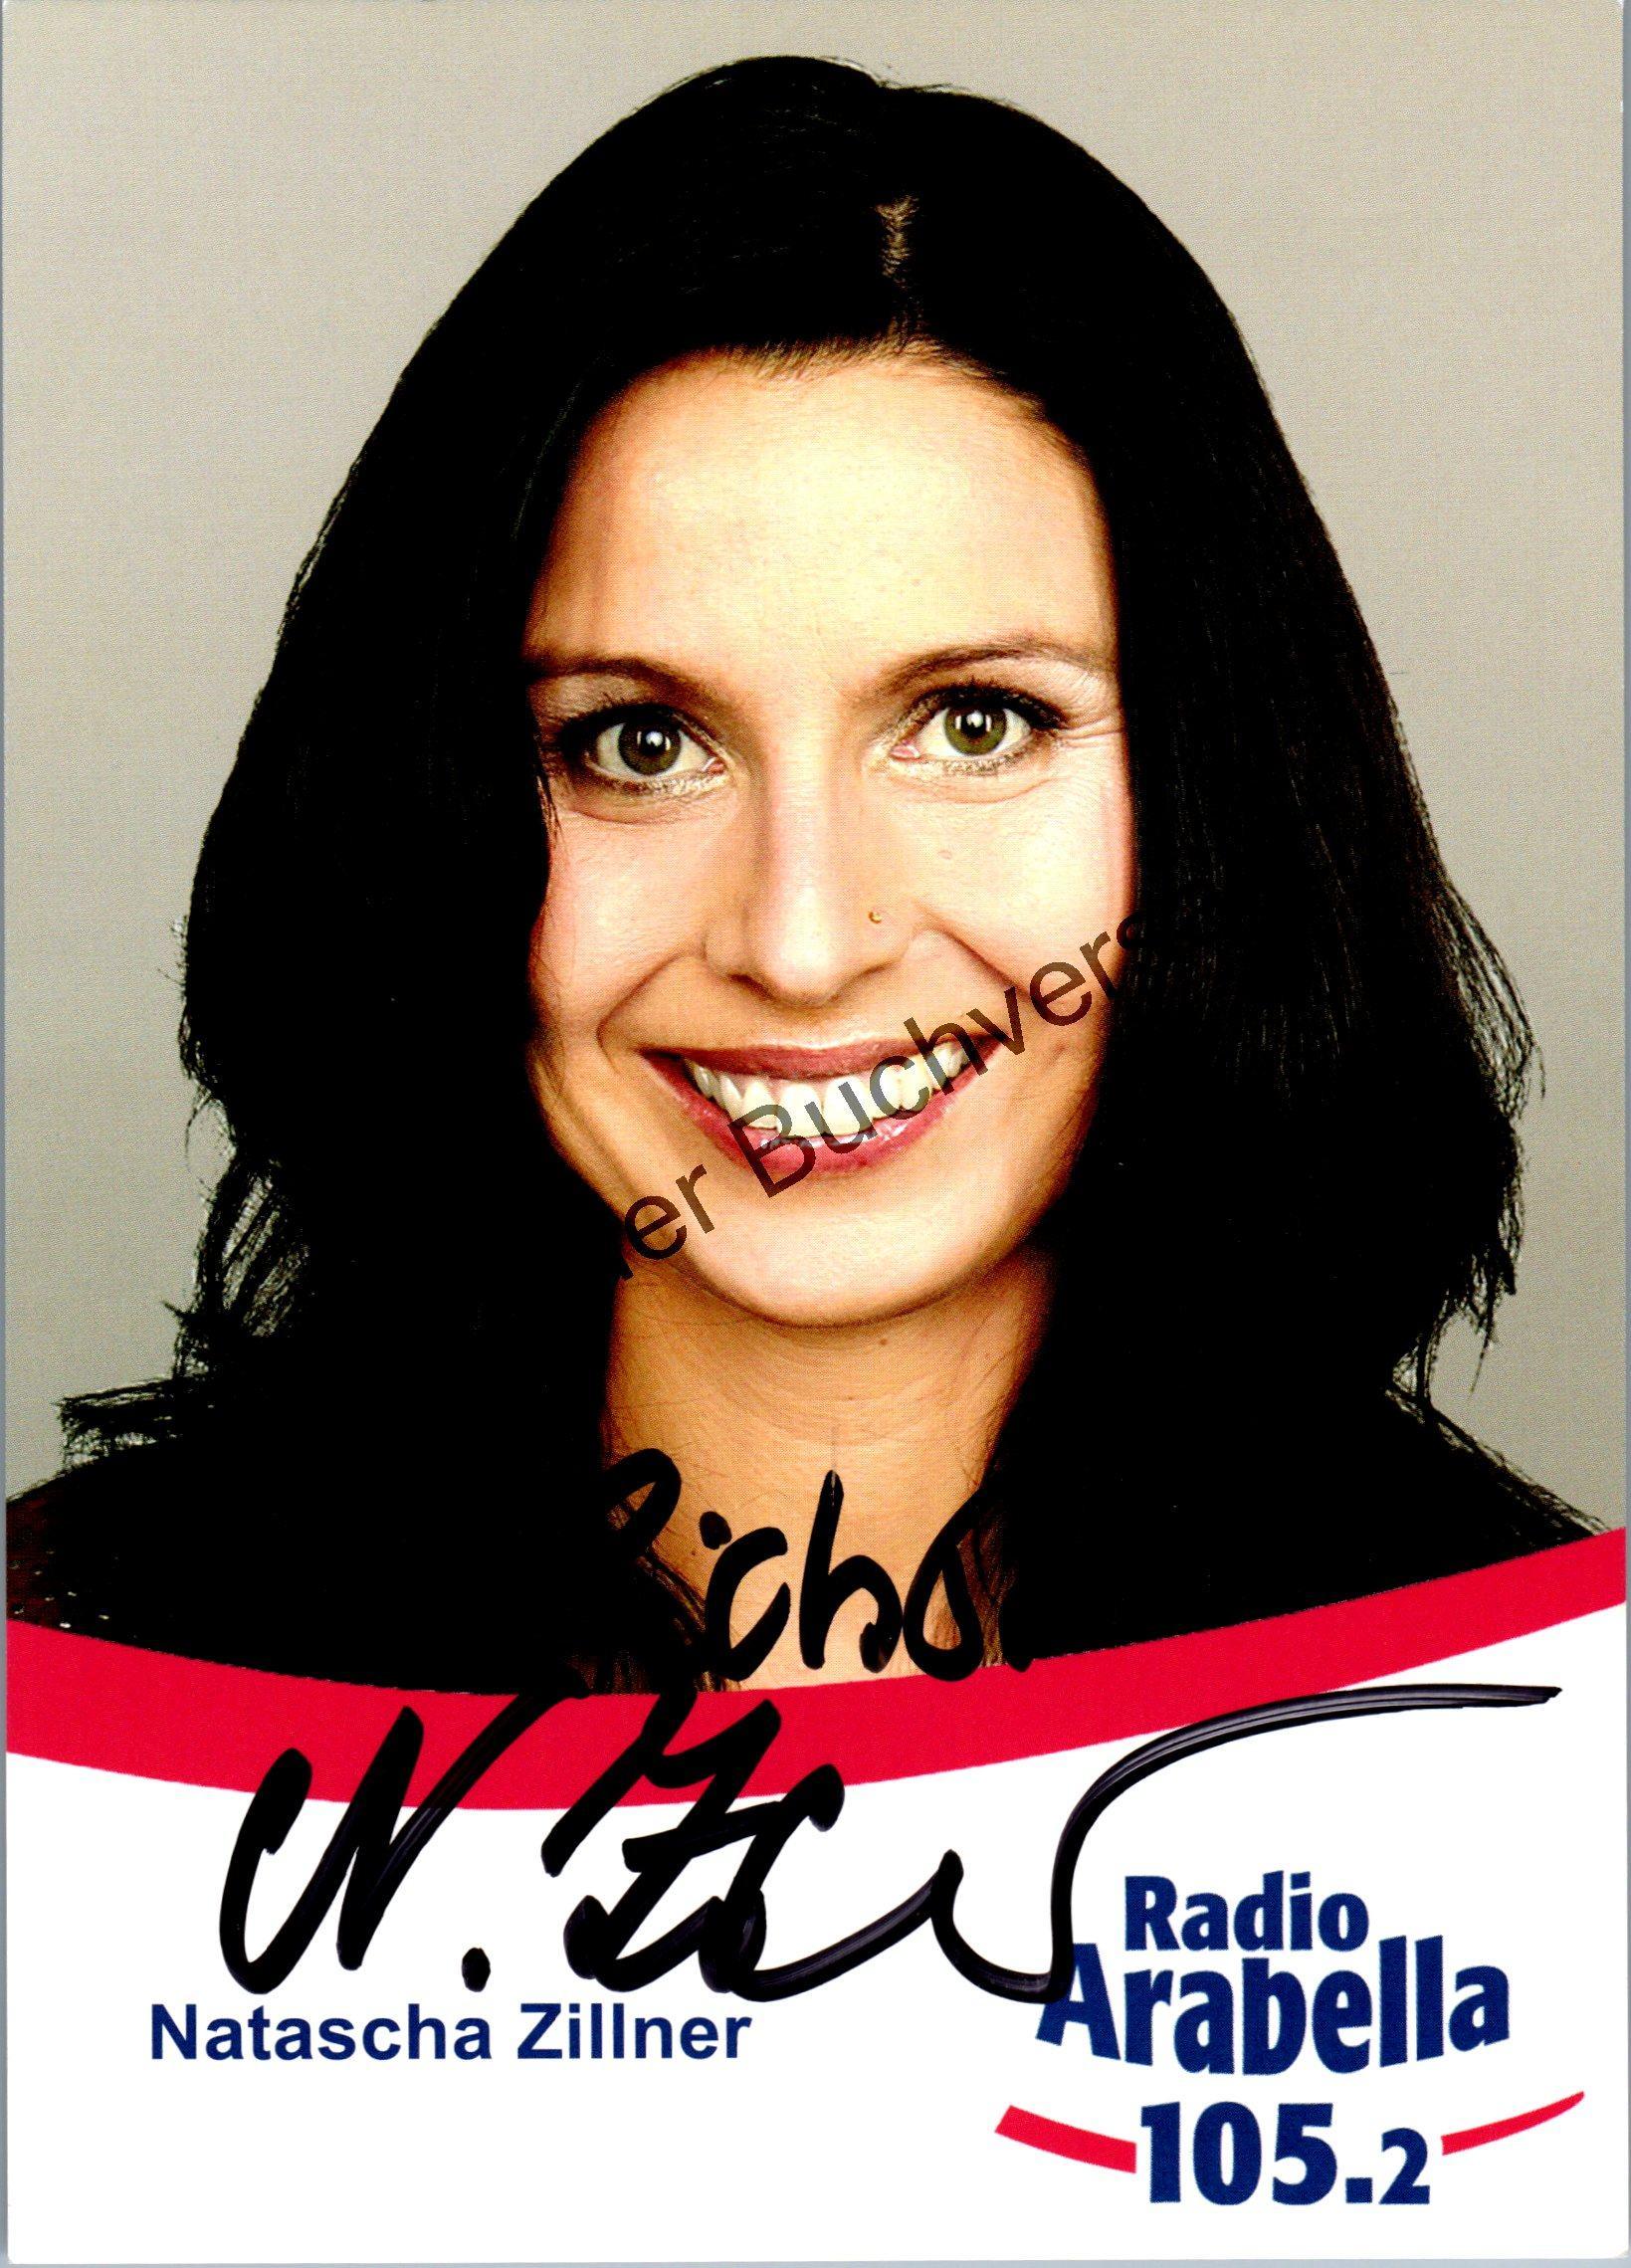 Original Autogramm Natascha Zillner Radio Arabella Moderatorin /// Autogramm Autograph signiert signed signee